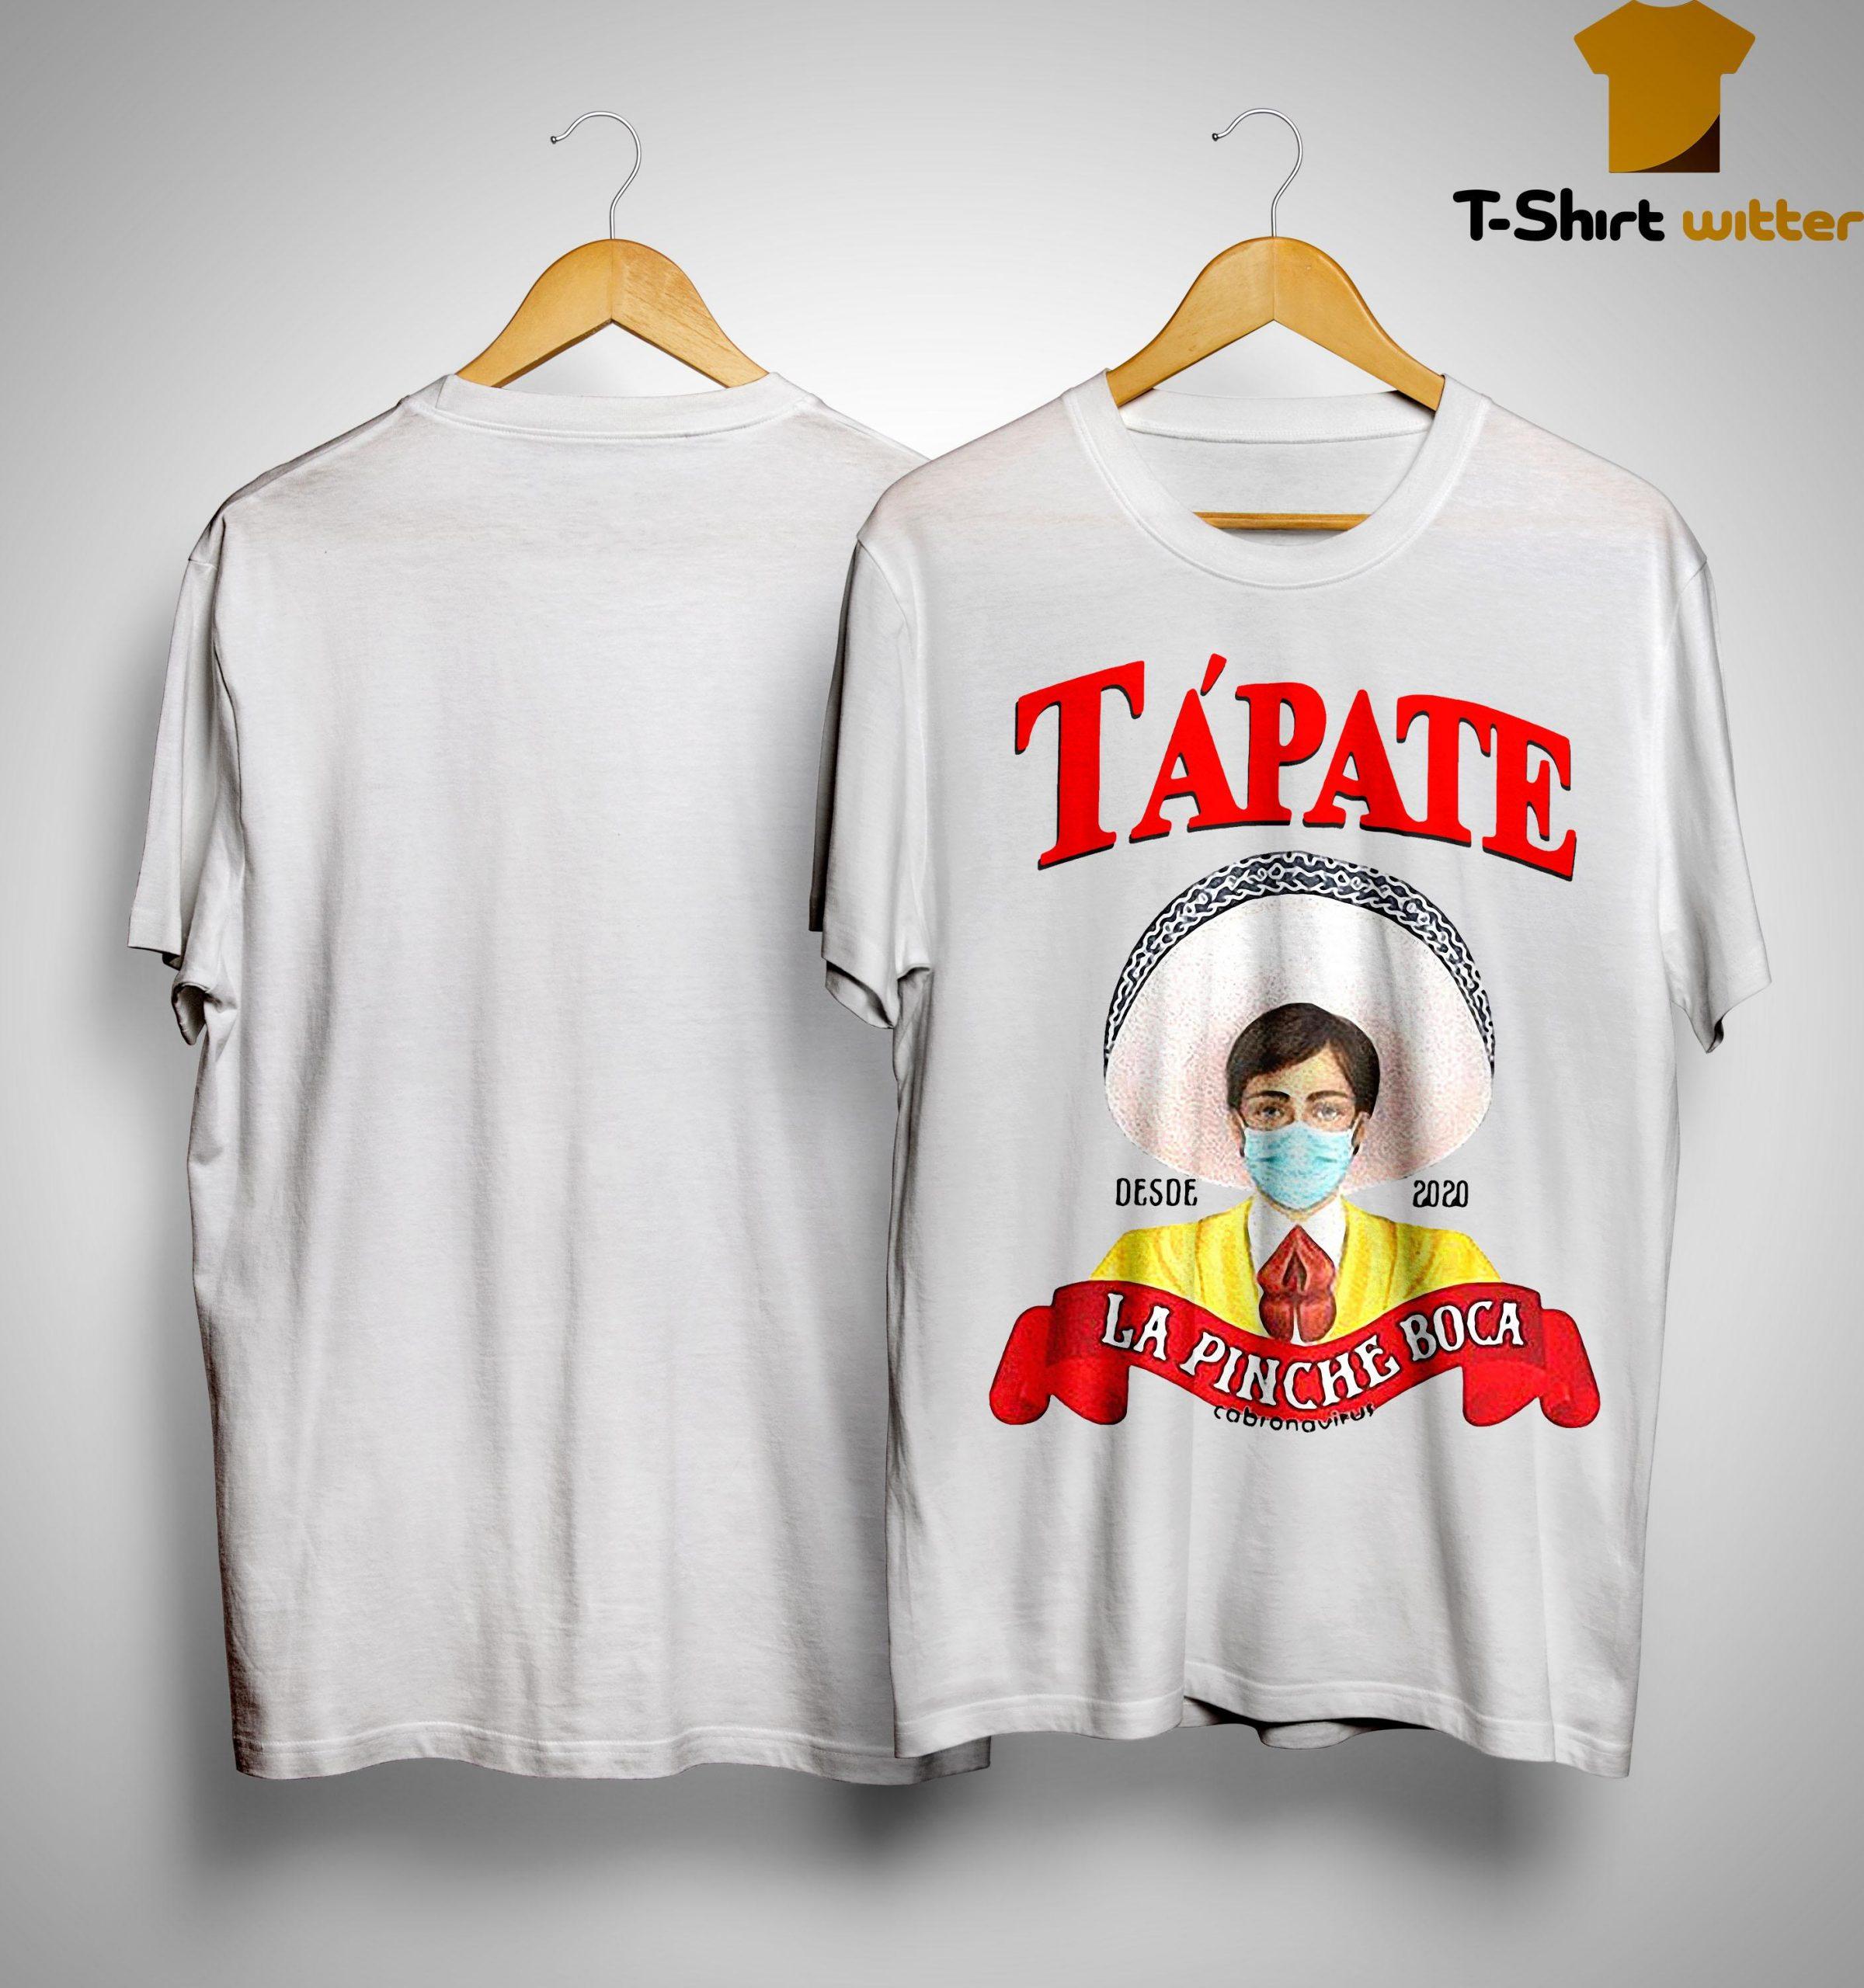 Tápate Desde 2020 La Pinche Boca Cabronavirus Shirt